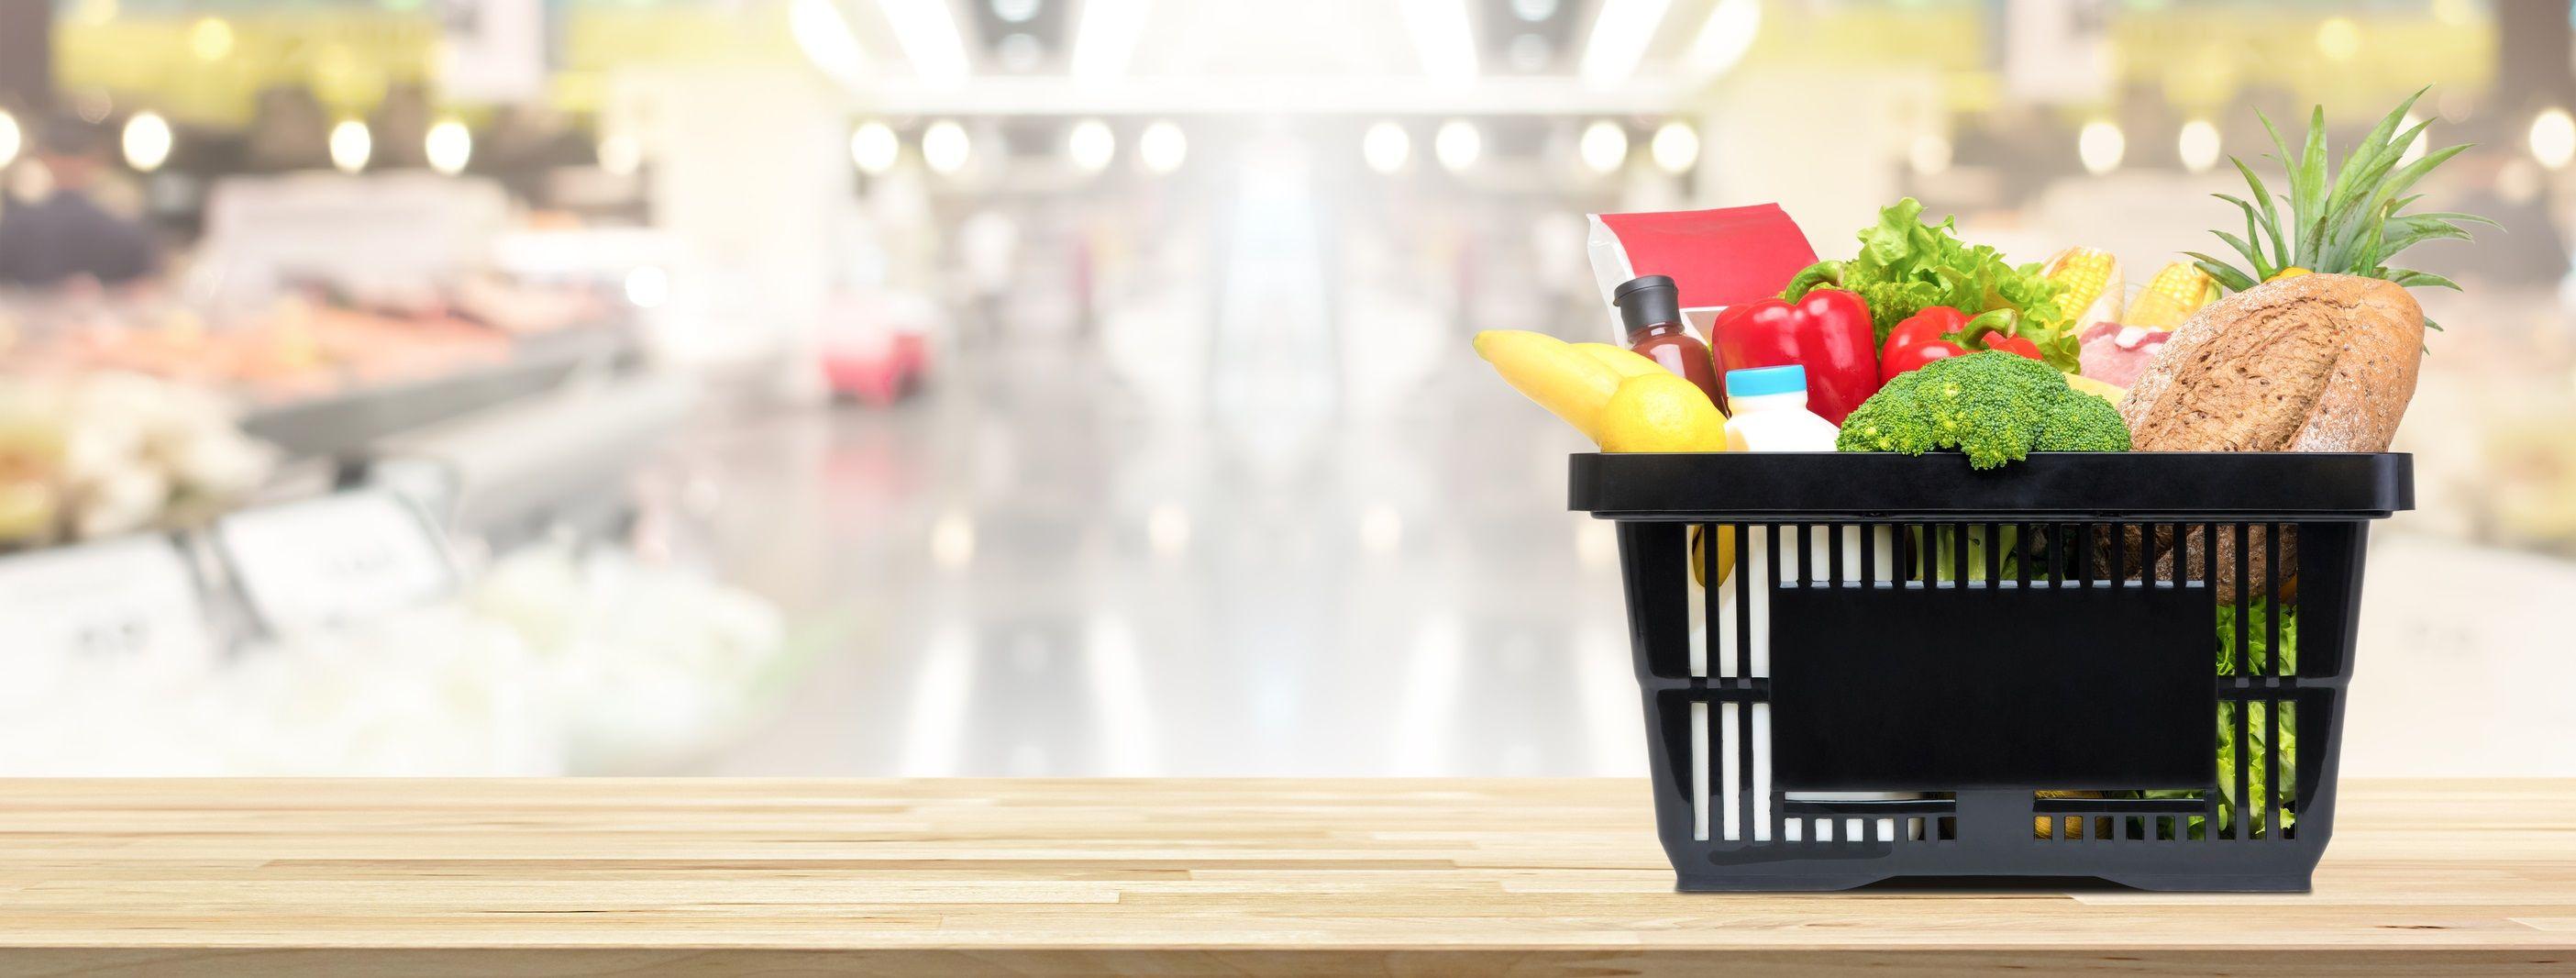 Penske Logistics Recognized as Leading Food and Beverage Service Provider